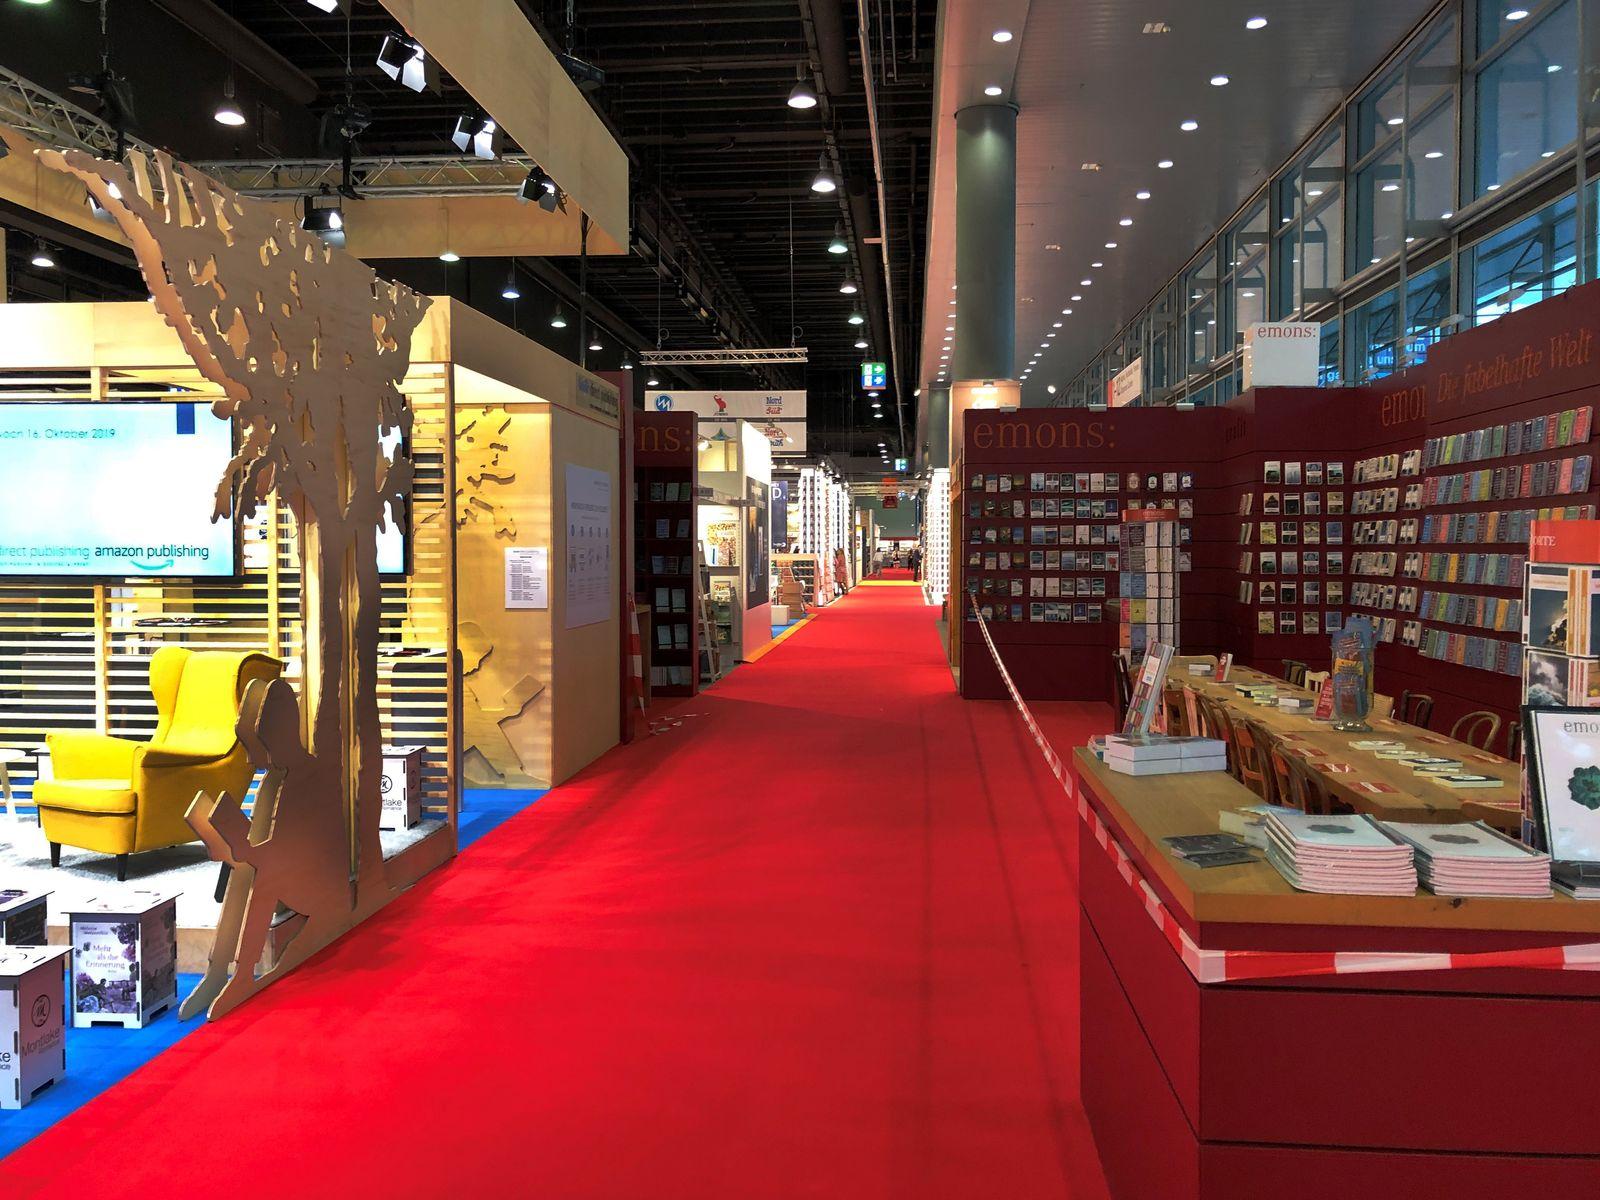 Volker Weidermann/ Buchmesse/ 2019/ Leere